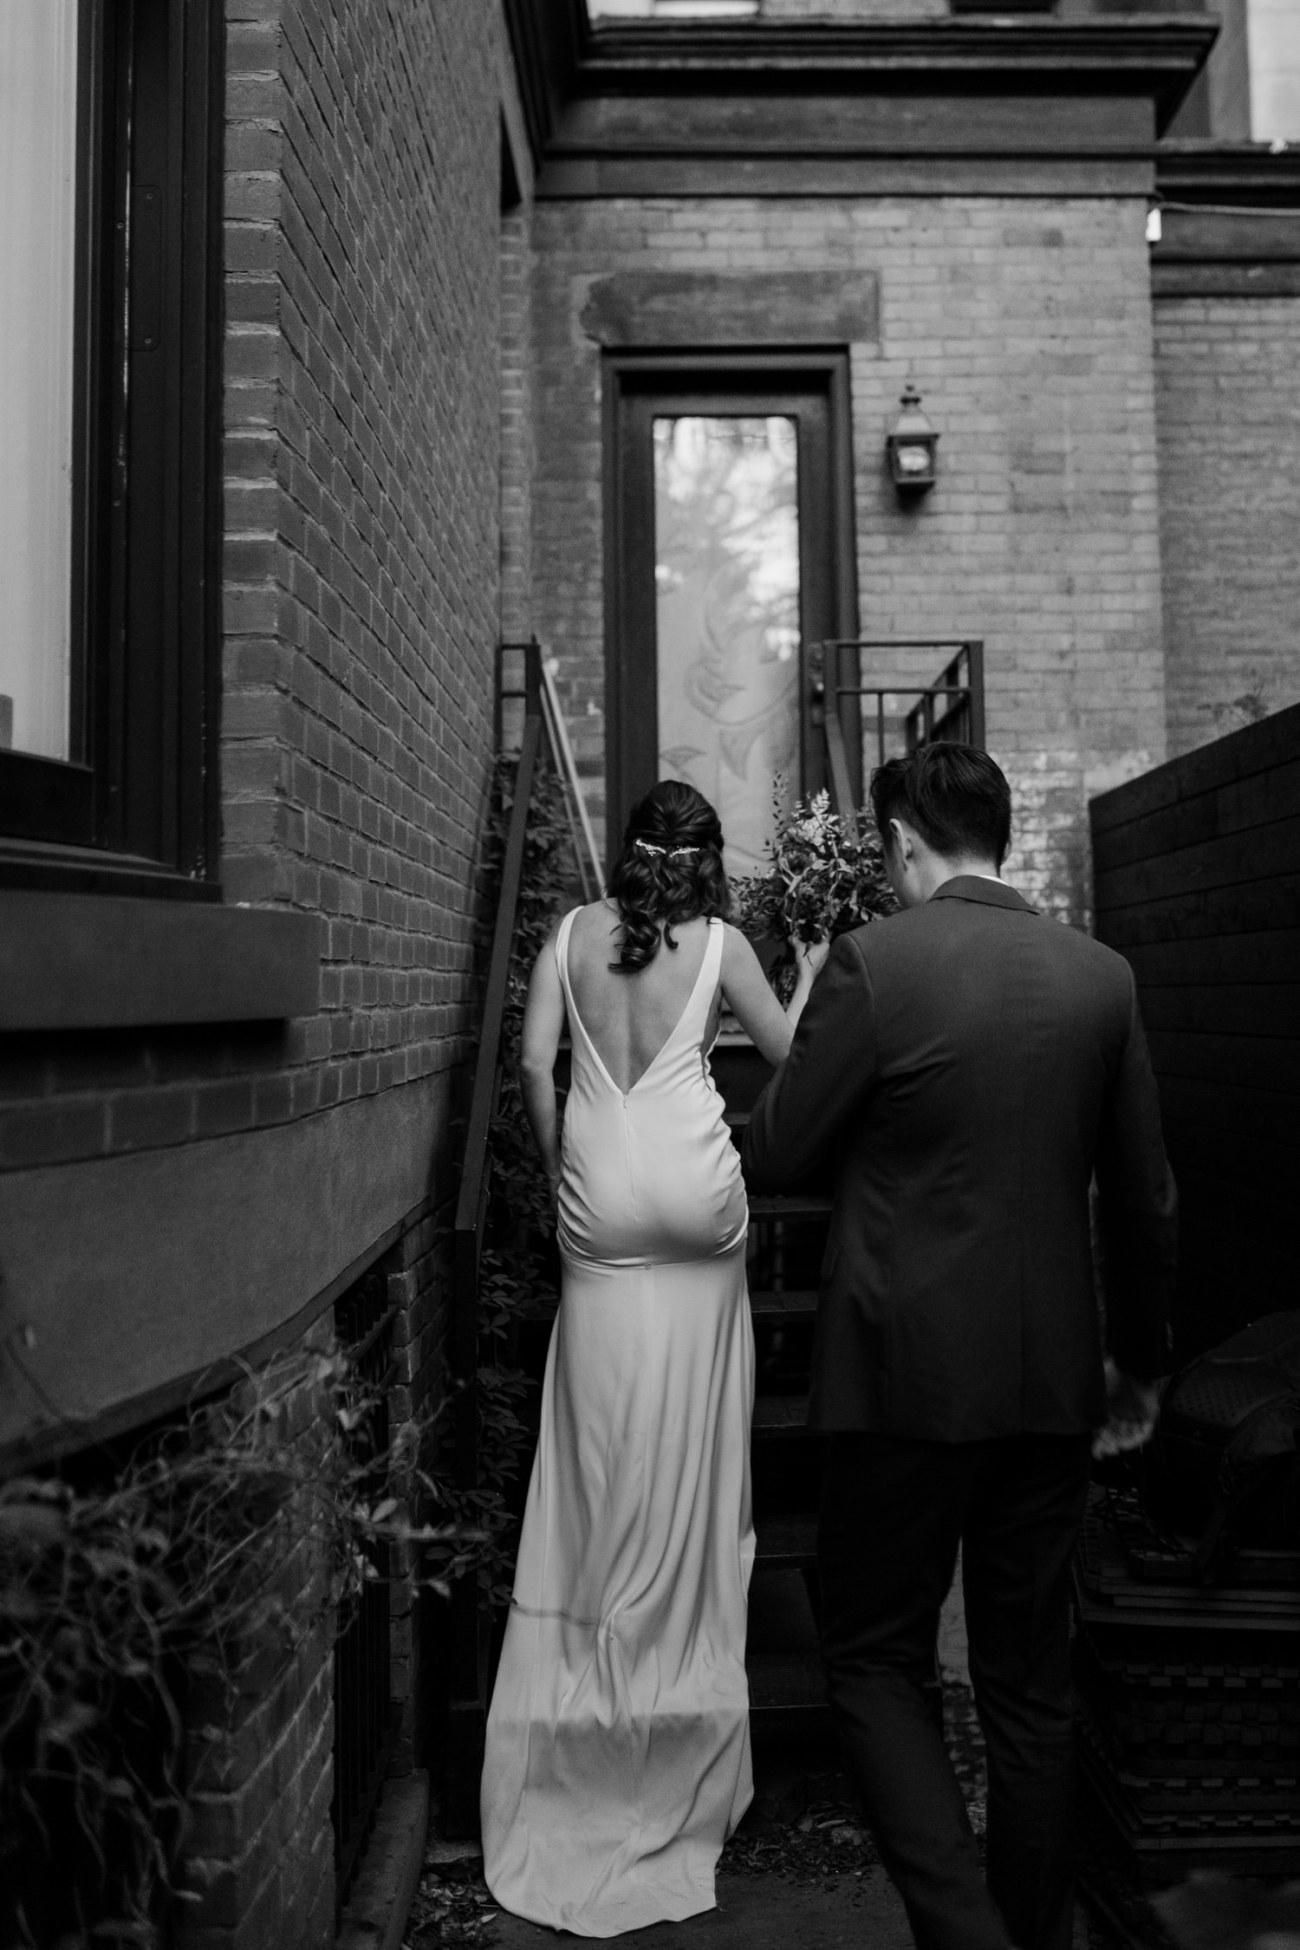 Brooklyn Backyard Wedding In Brownstone House New York City Wedding Photographer Anais Possamai Photography 19